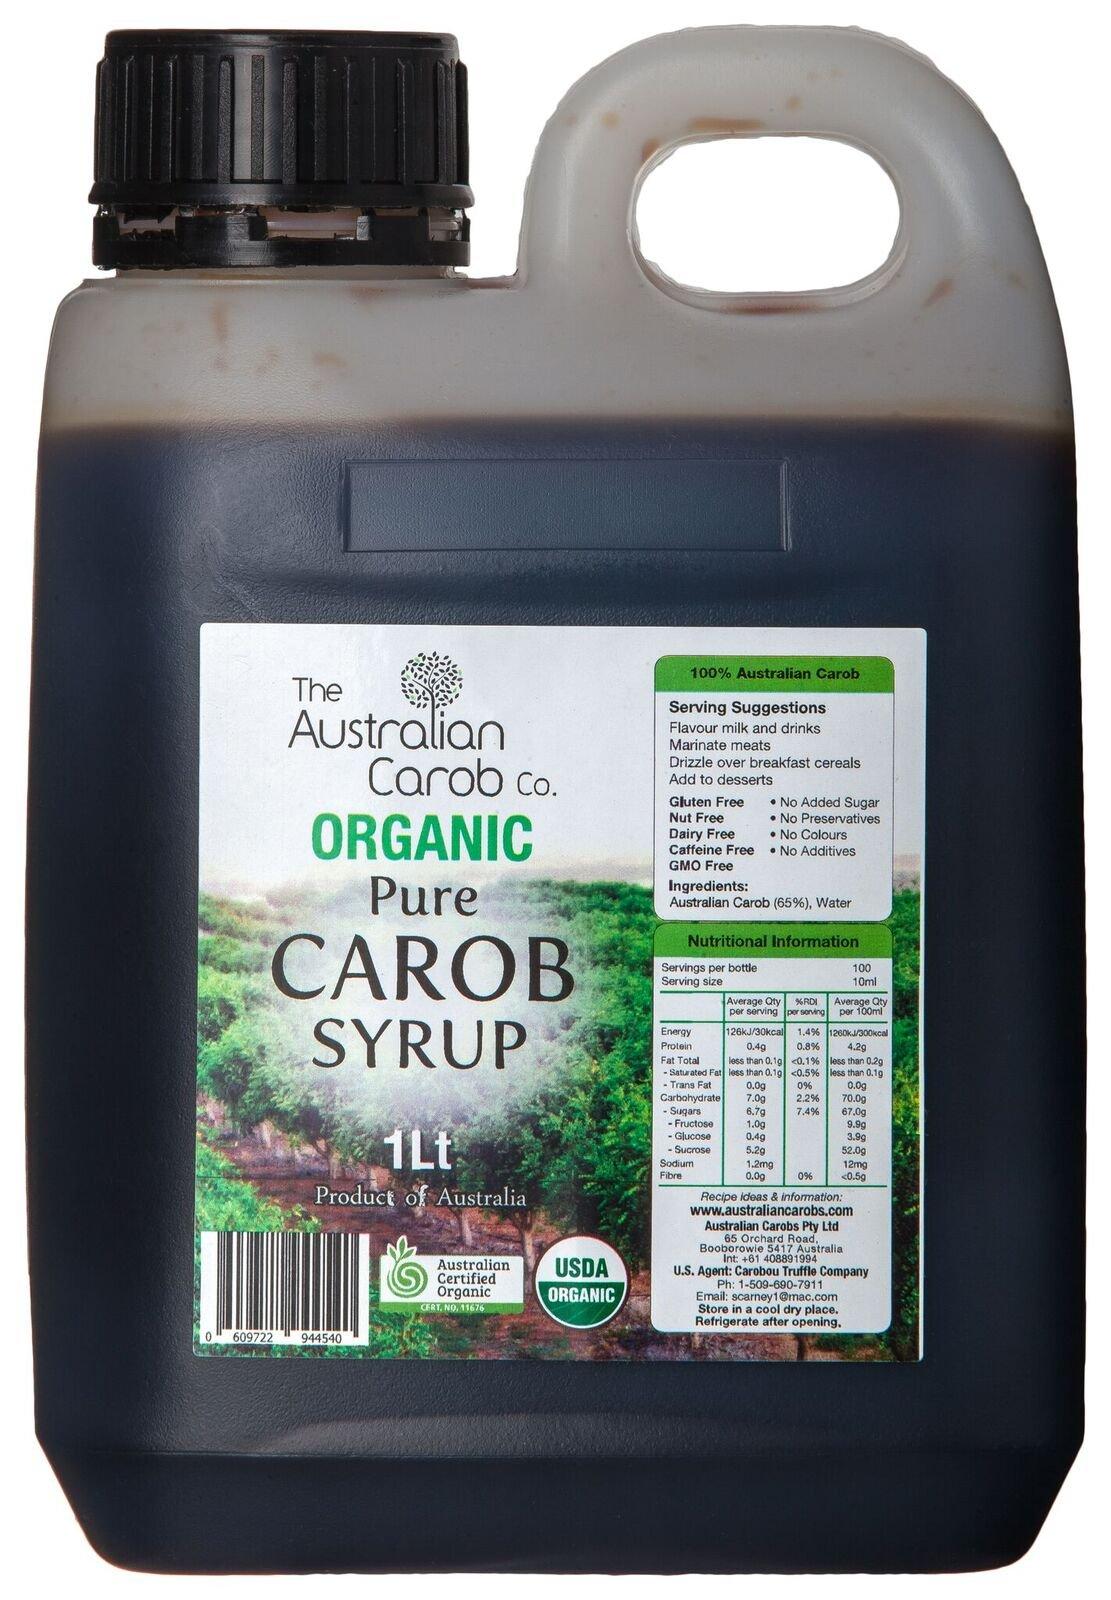 Australian, Organic, Pure, Carob Syrup, Superfood, 33.8fl.oz, Paleo, NON-GMO, World's #1 Best Tasting Pure Carob Syrup,Vegan, New Generation Carob, Carob, Carob Syrup, organic carob, Aussie SharkBars